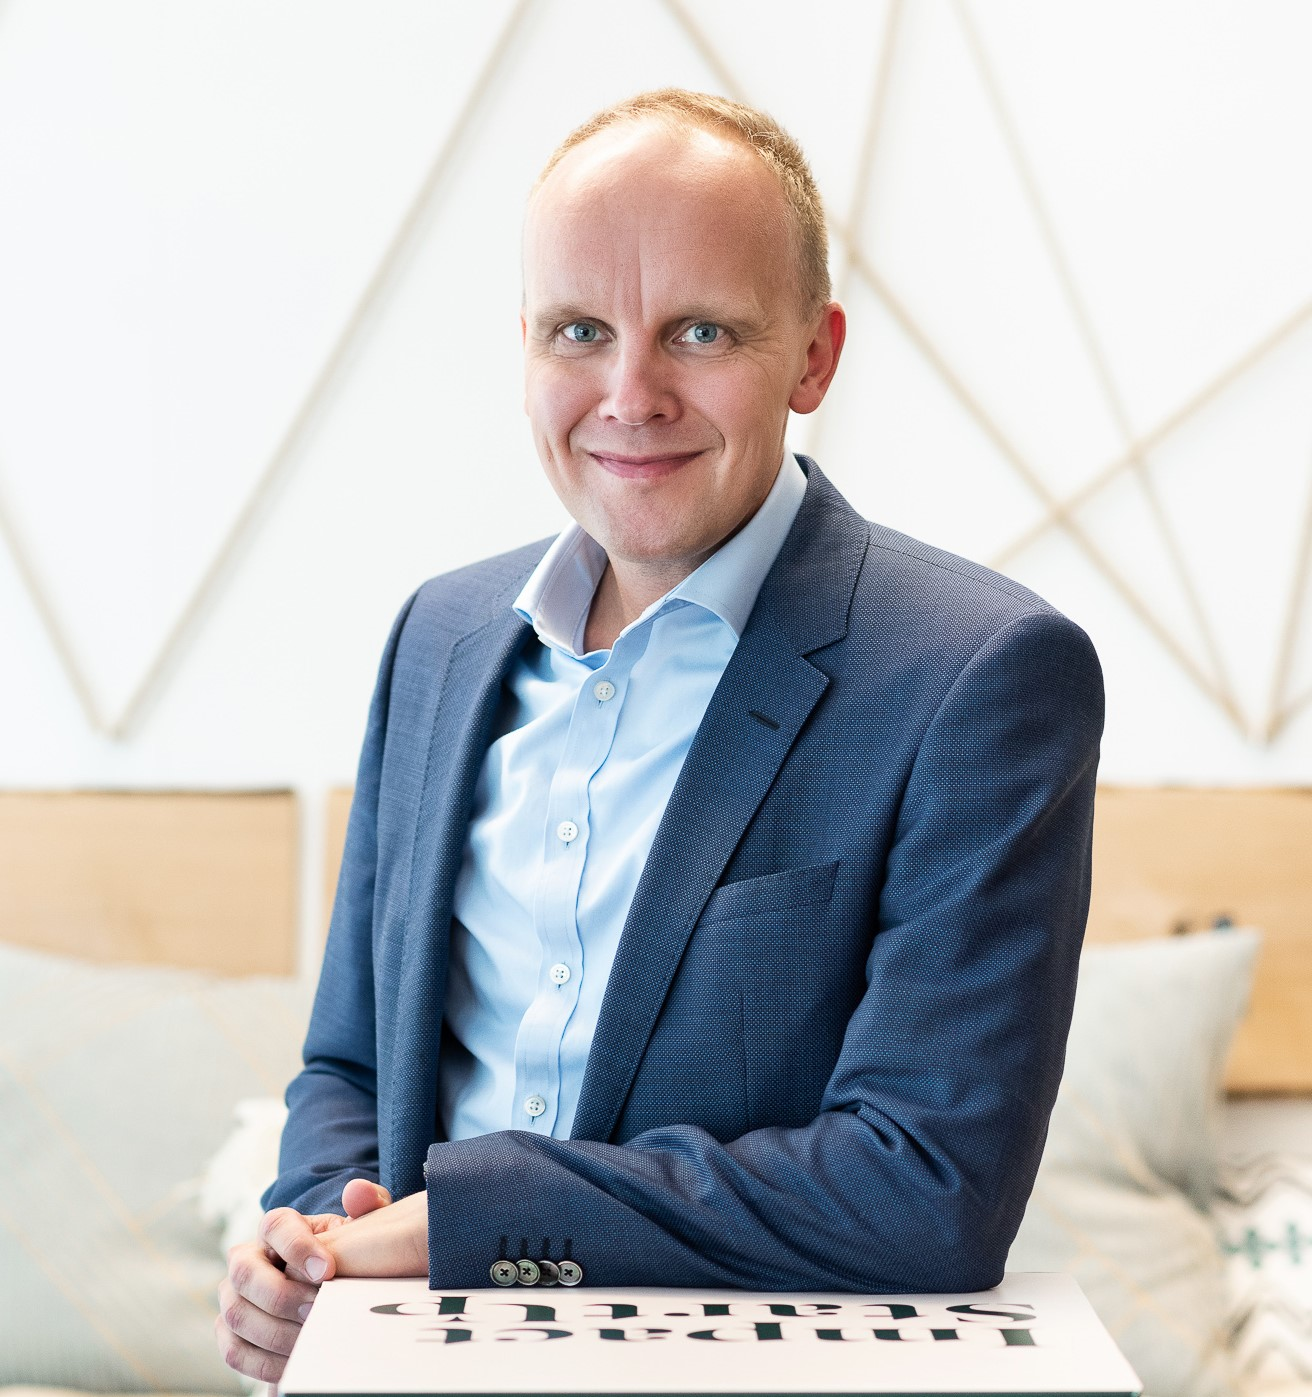 Juha Keski-Filppula